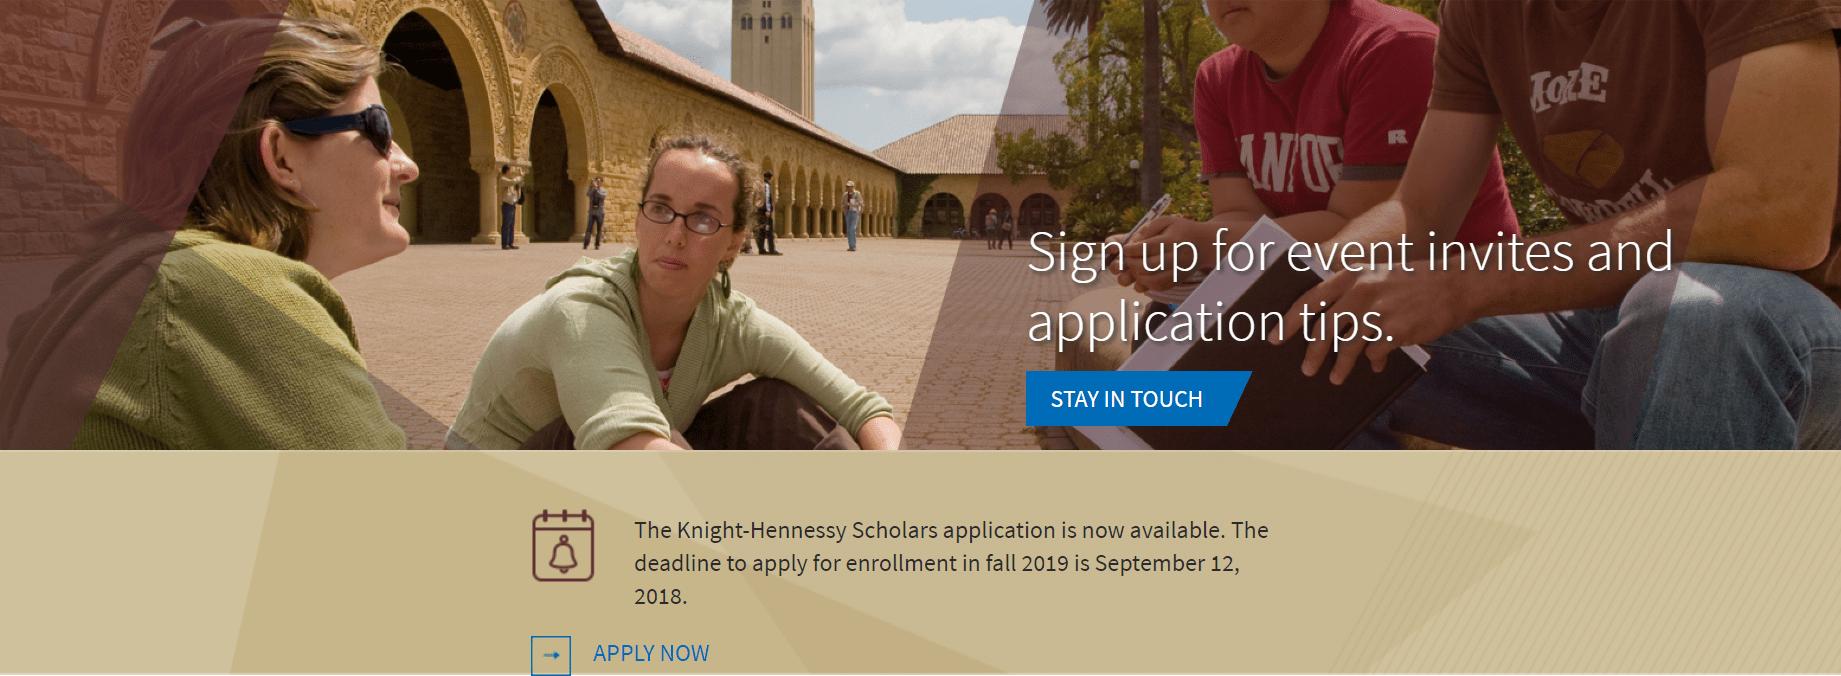 stanford graduate application deadline